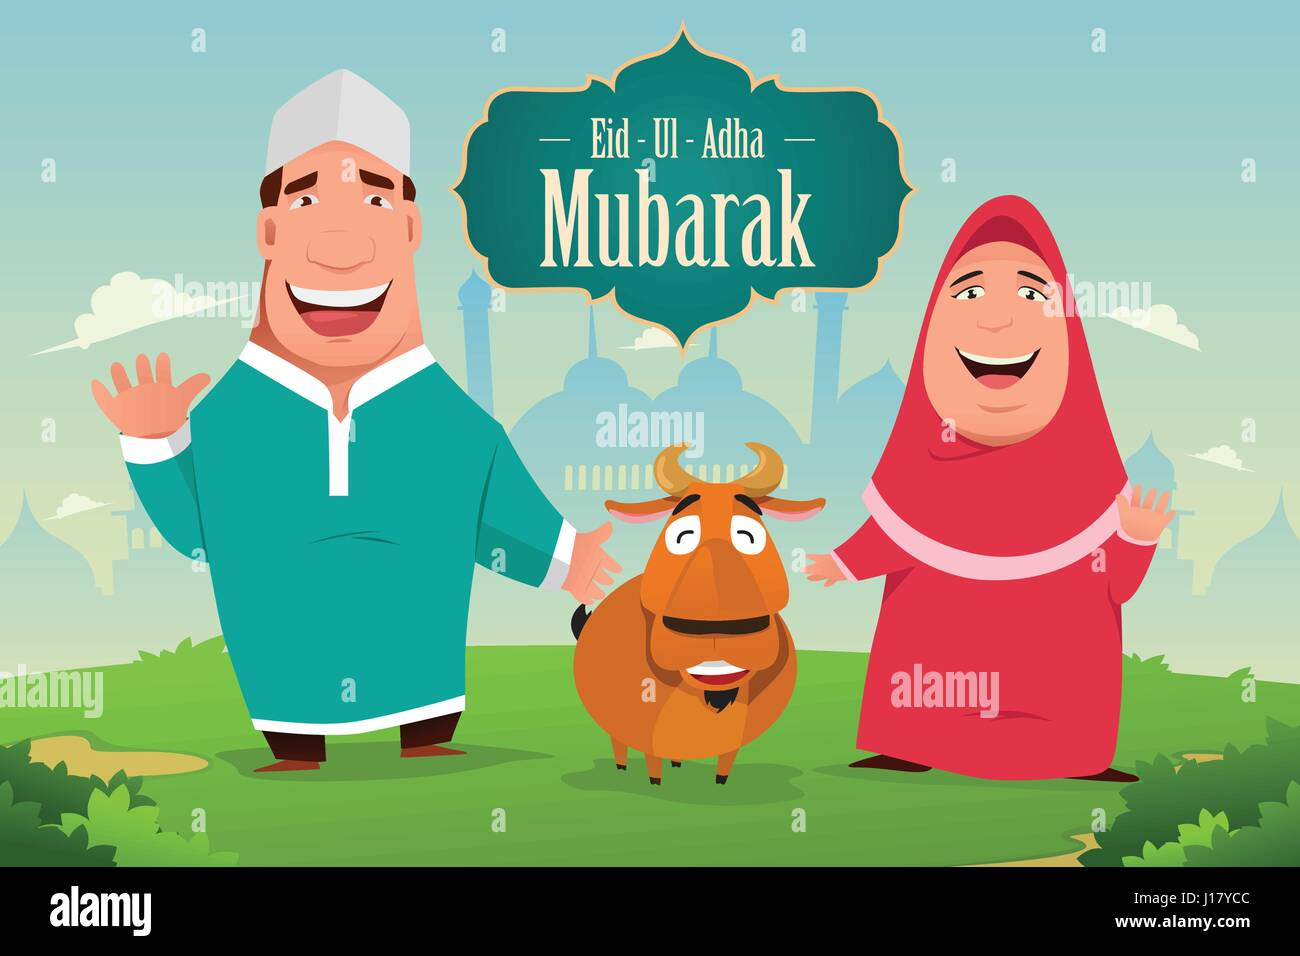 A Vector Illustration Of Eid Ul Adha Mubarak Greeting Card Design